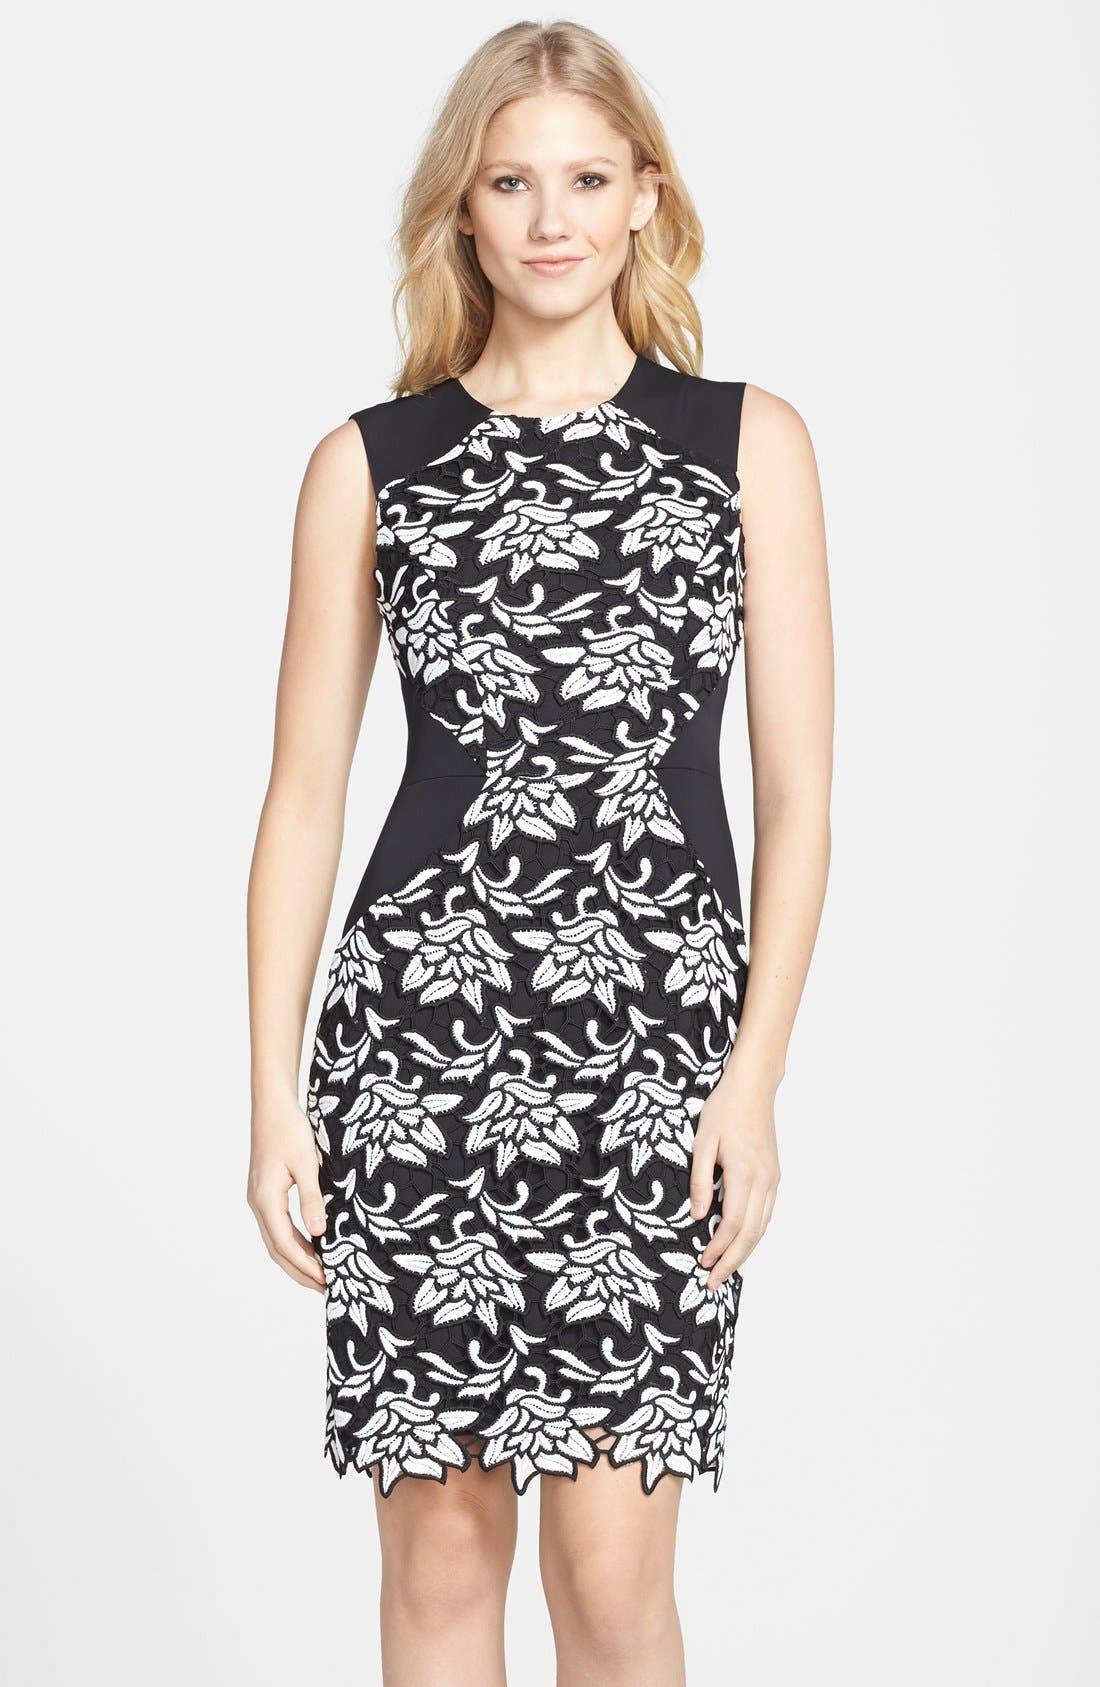 BCBGMAXAZRIA 'Laurine' Floral Lace Overlay Sheath Dress